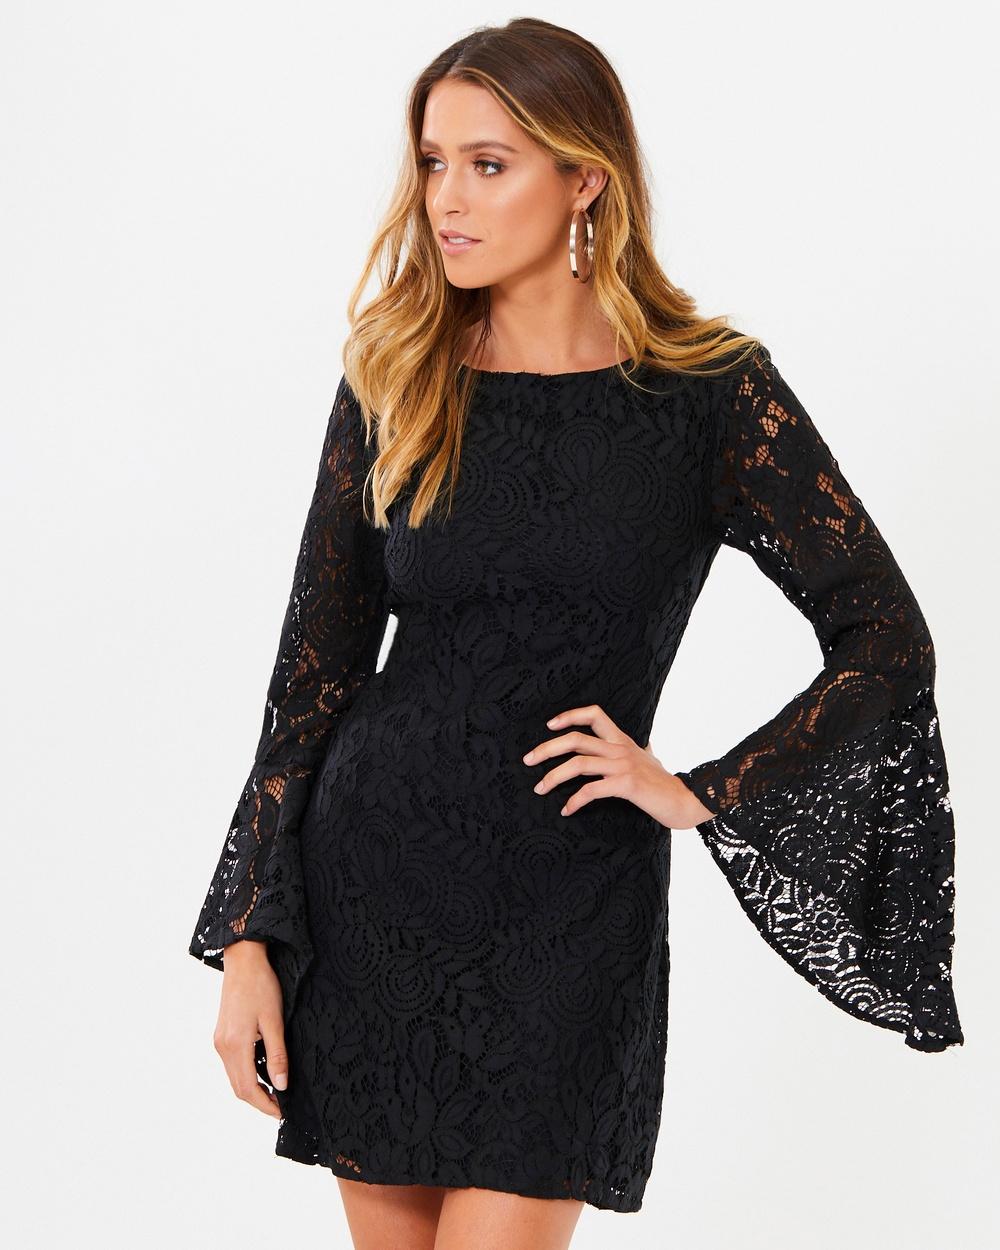 Photo of Tussah Black Lace Tilda Lace Mini Dress - beautiful dress from Tussah online